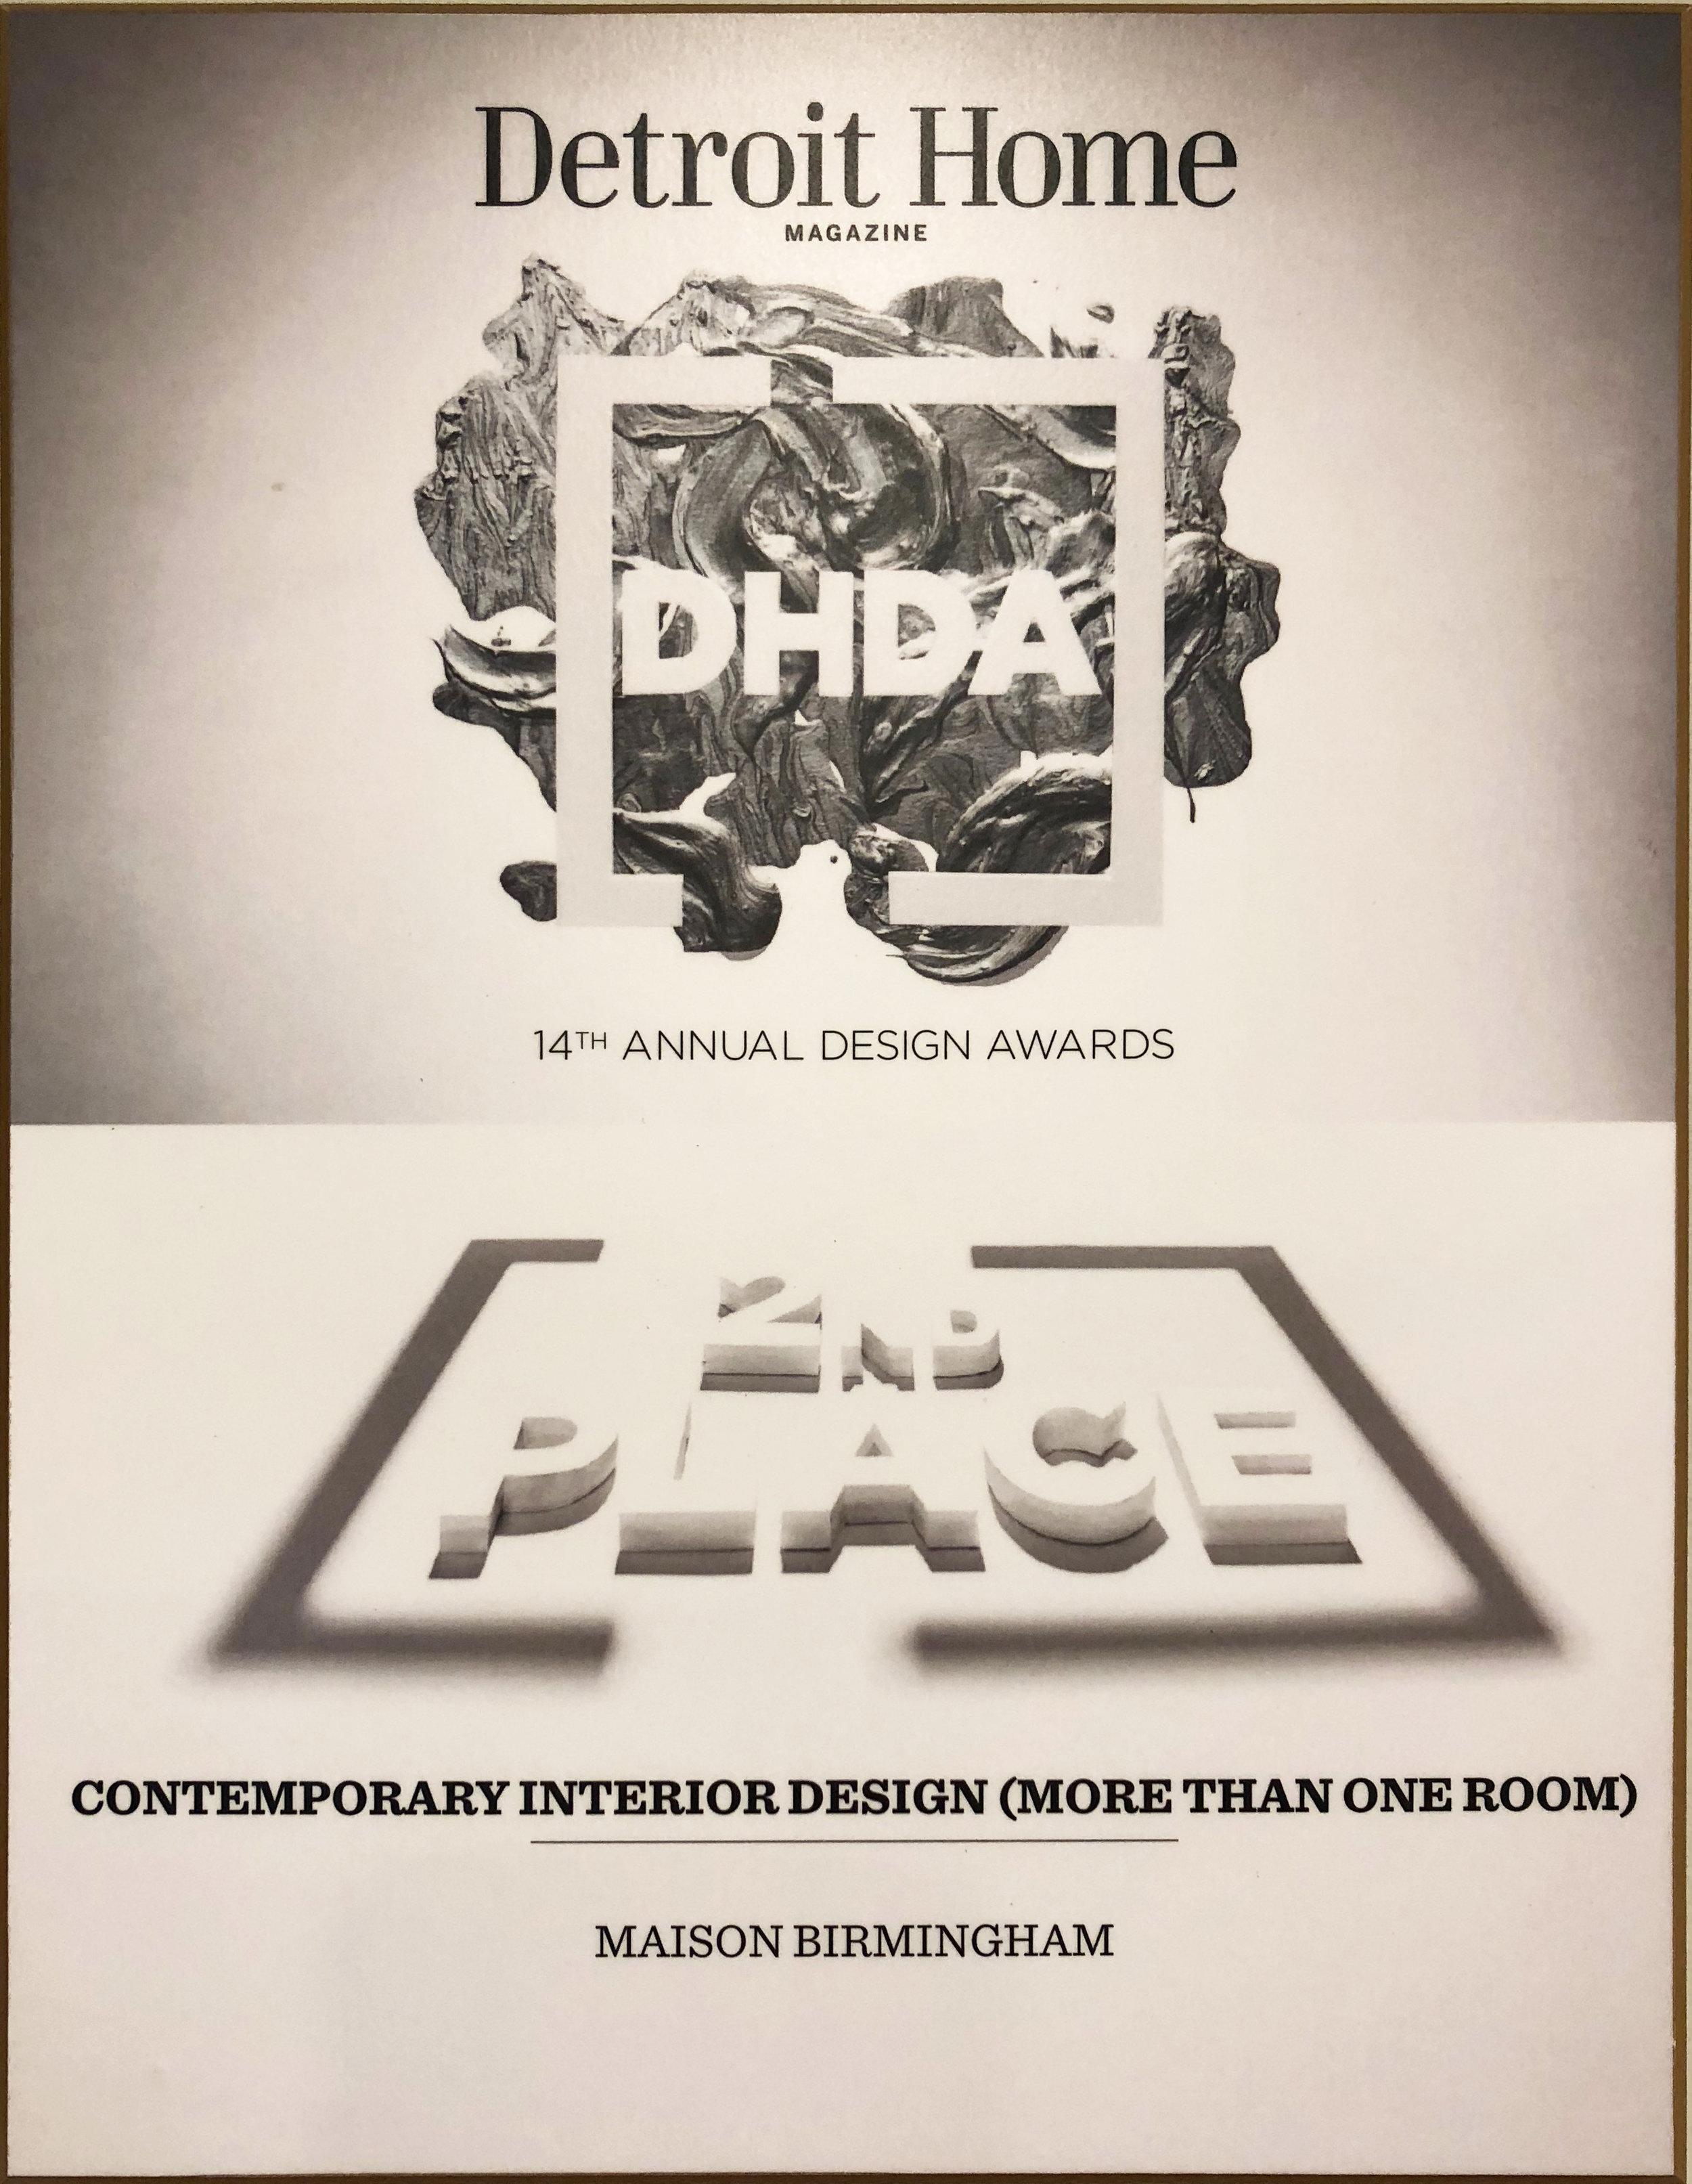 contemporary interior design.jpg